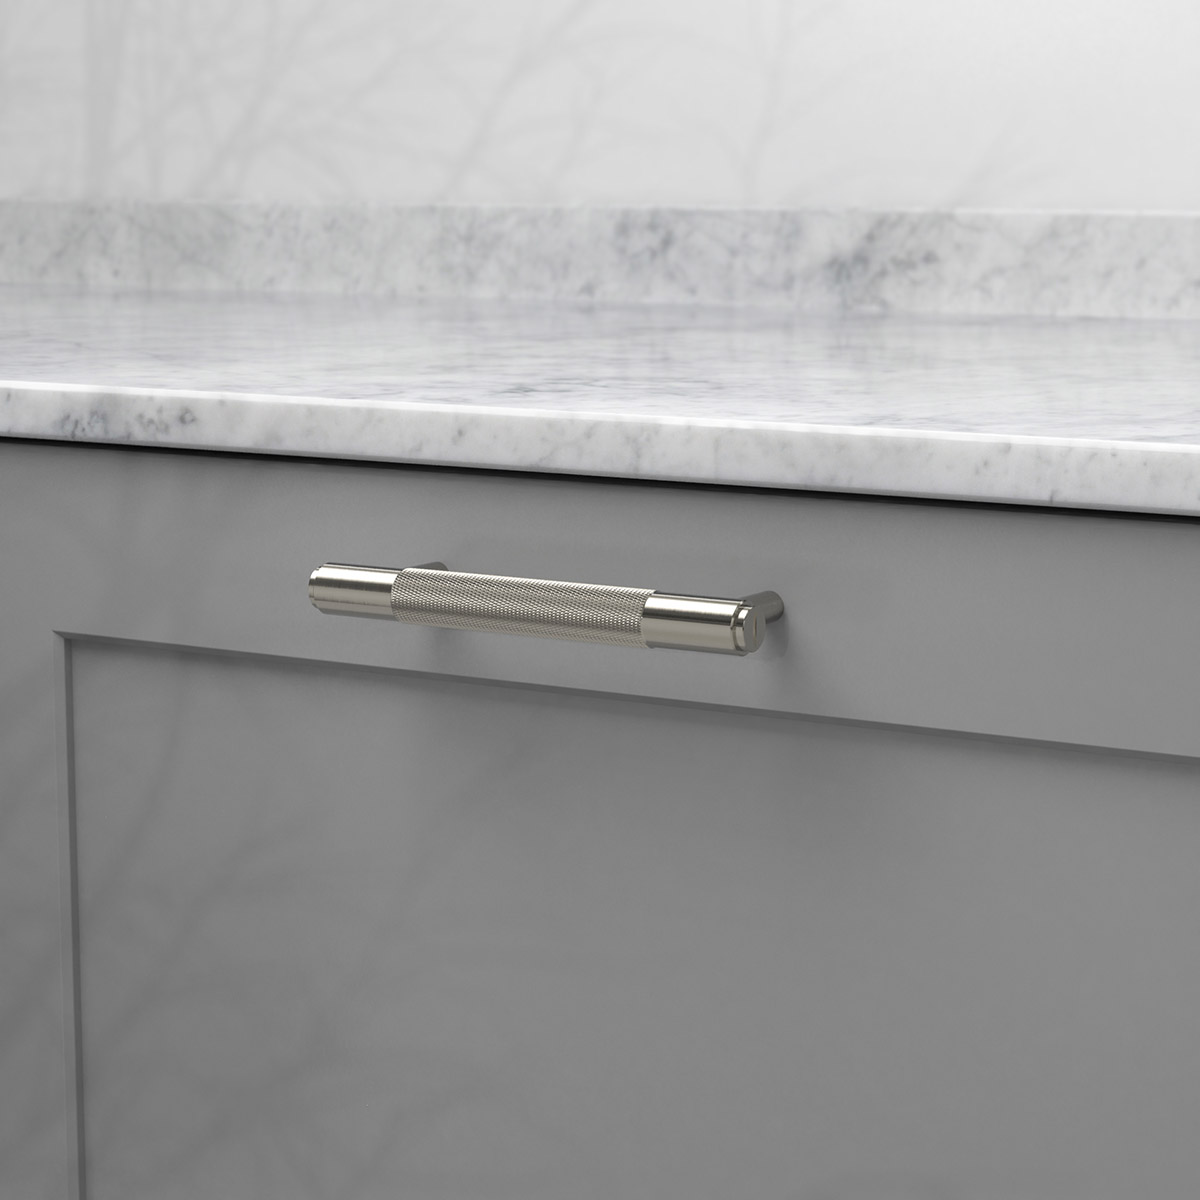 pull bar stål uk pb h 160 st a cc 125 mm ncs s 4500 n marmor carrara 2